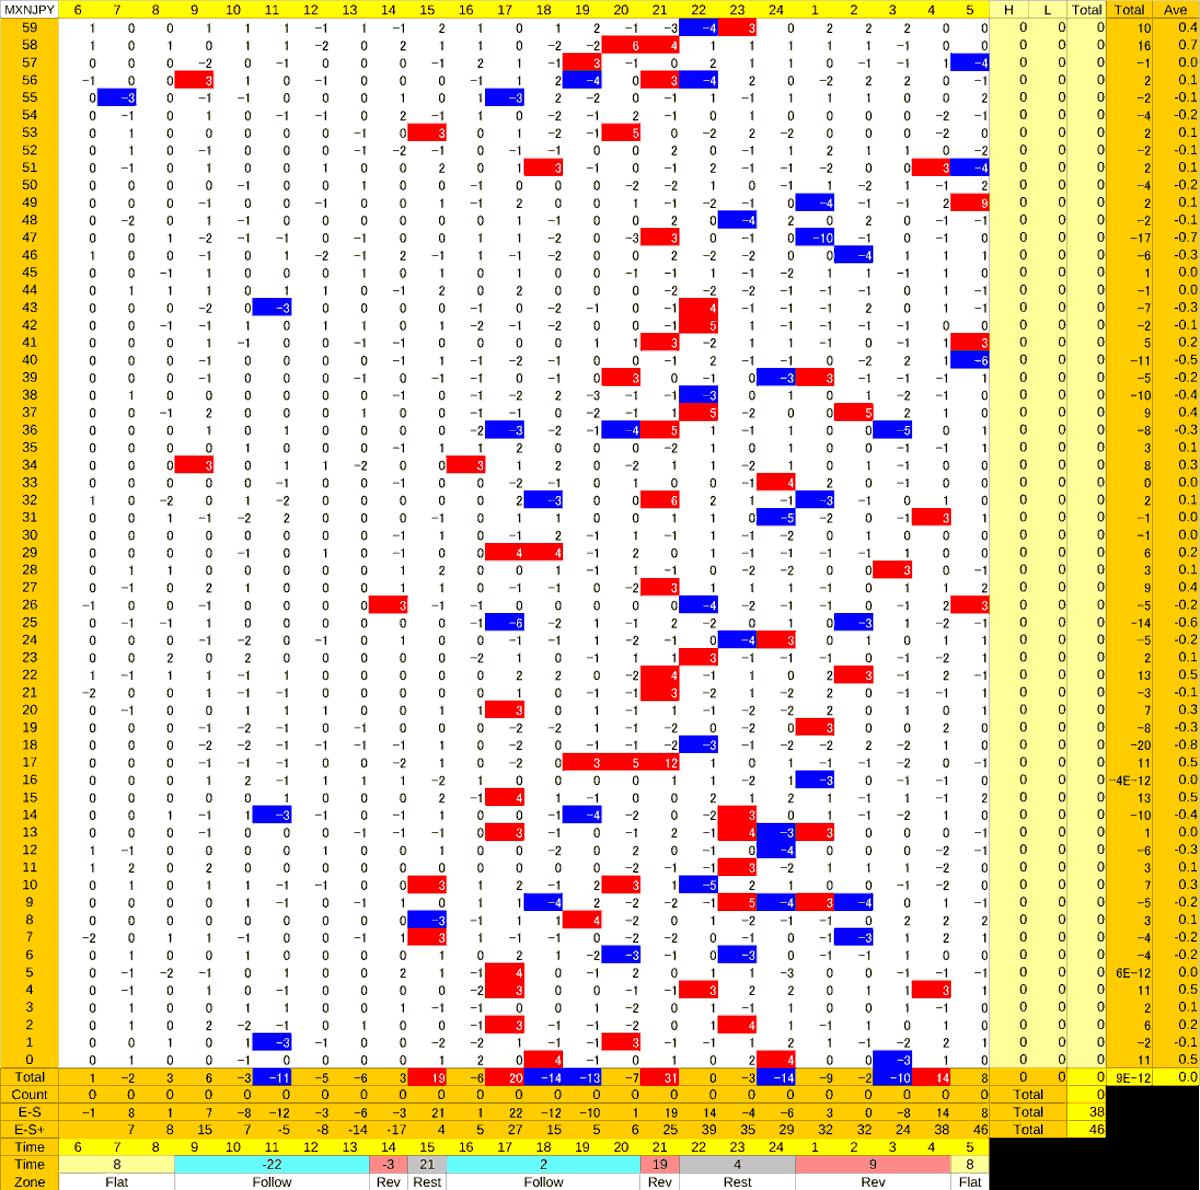 20200701_HS(3)MXNJPY